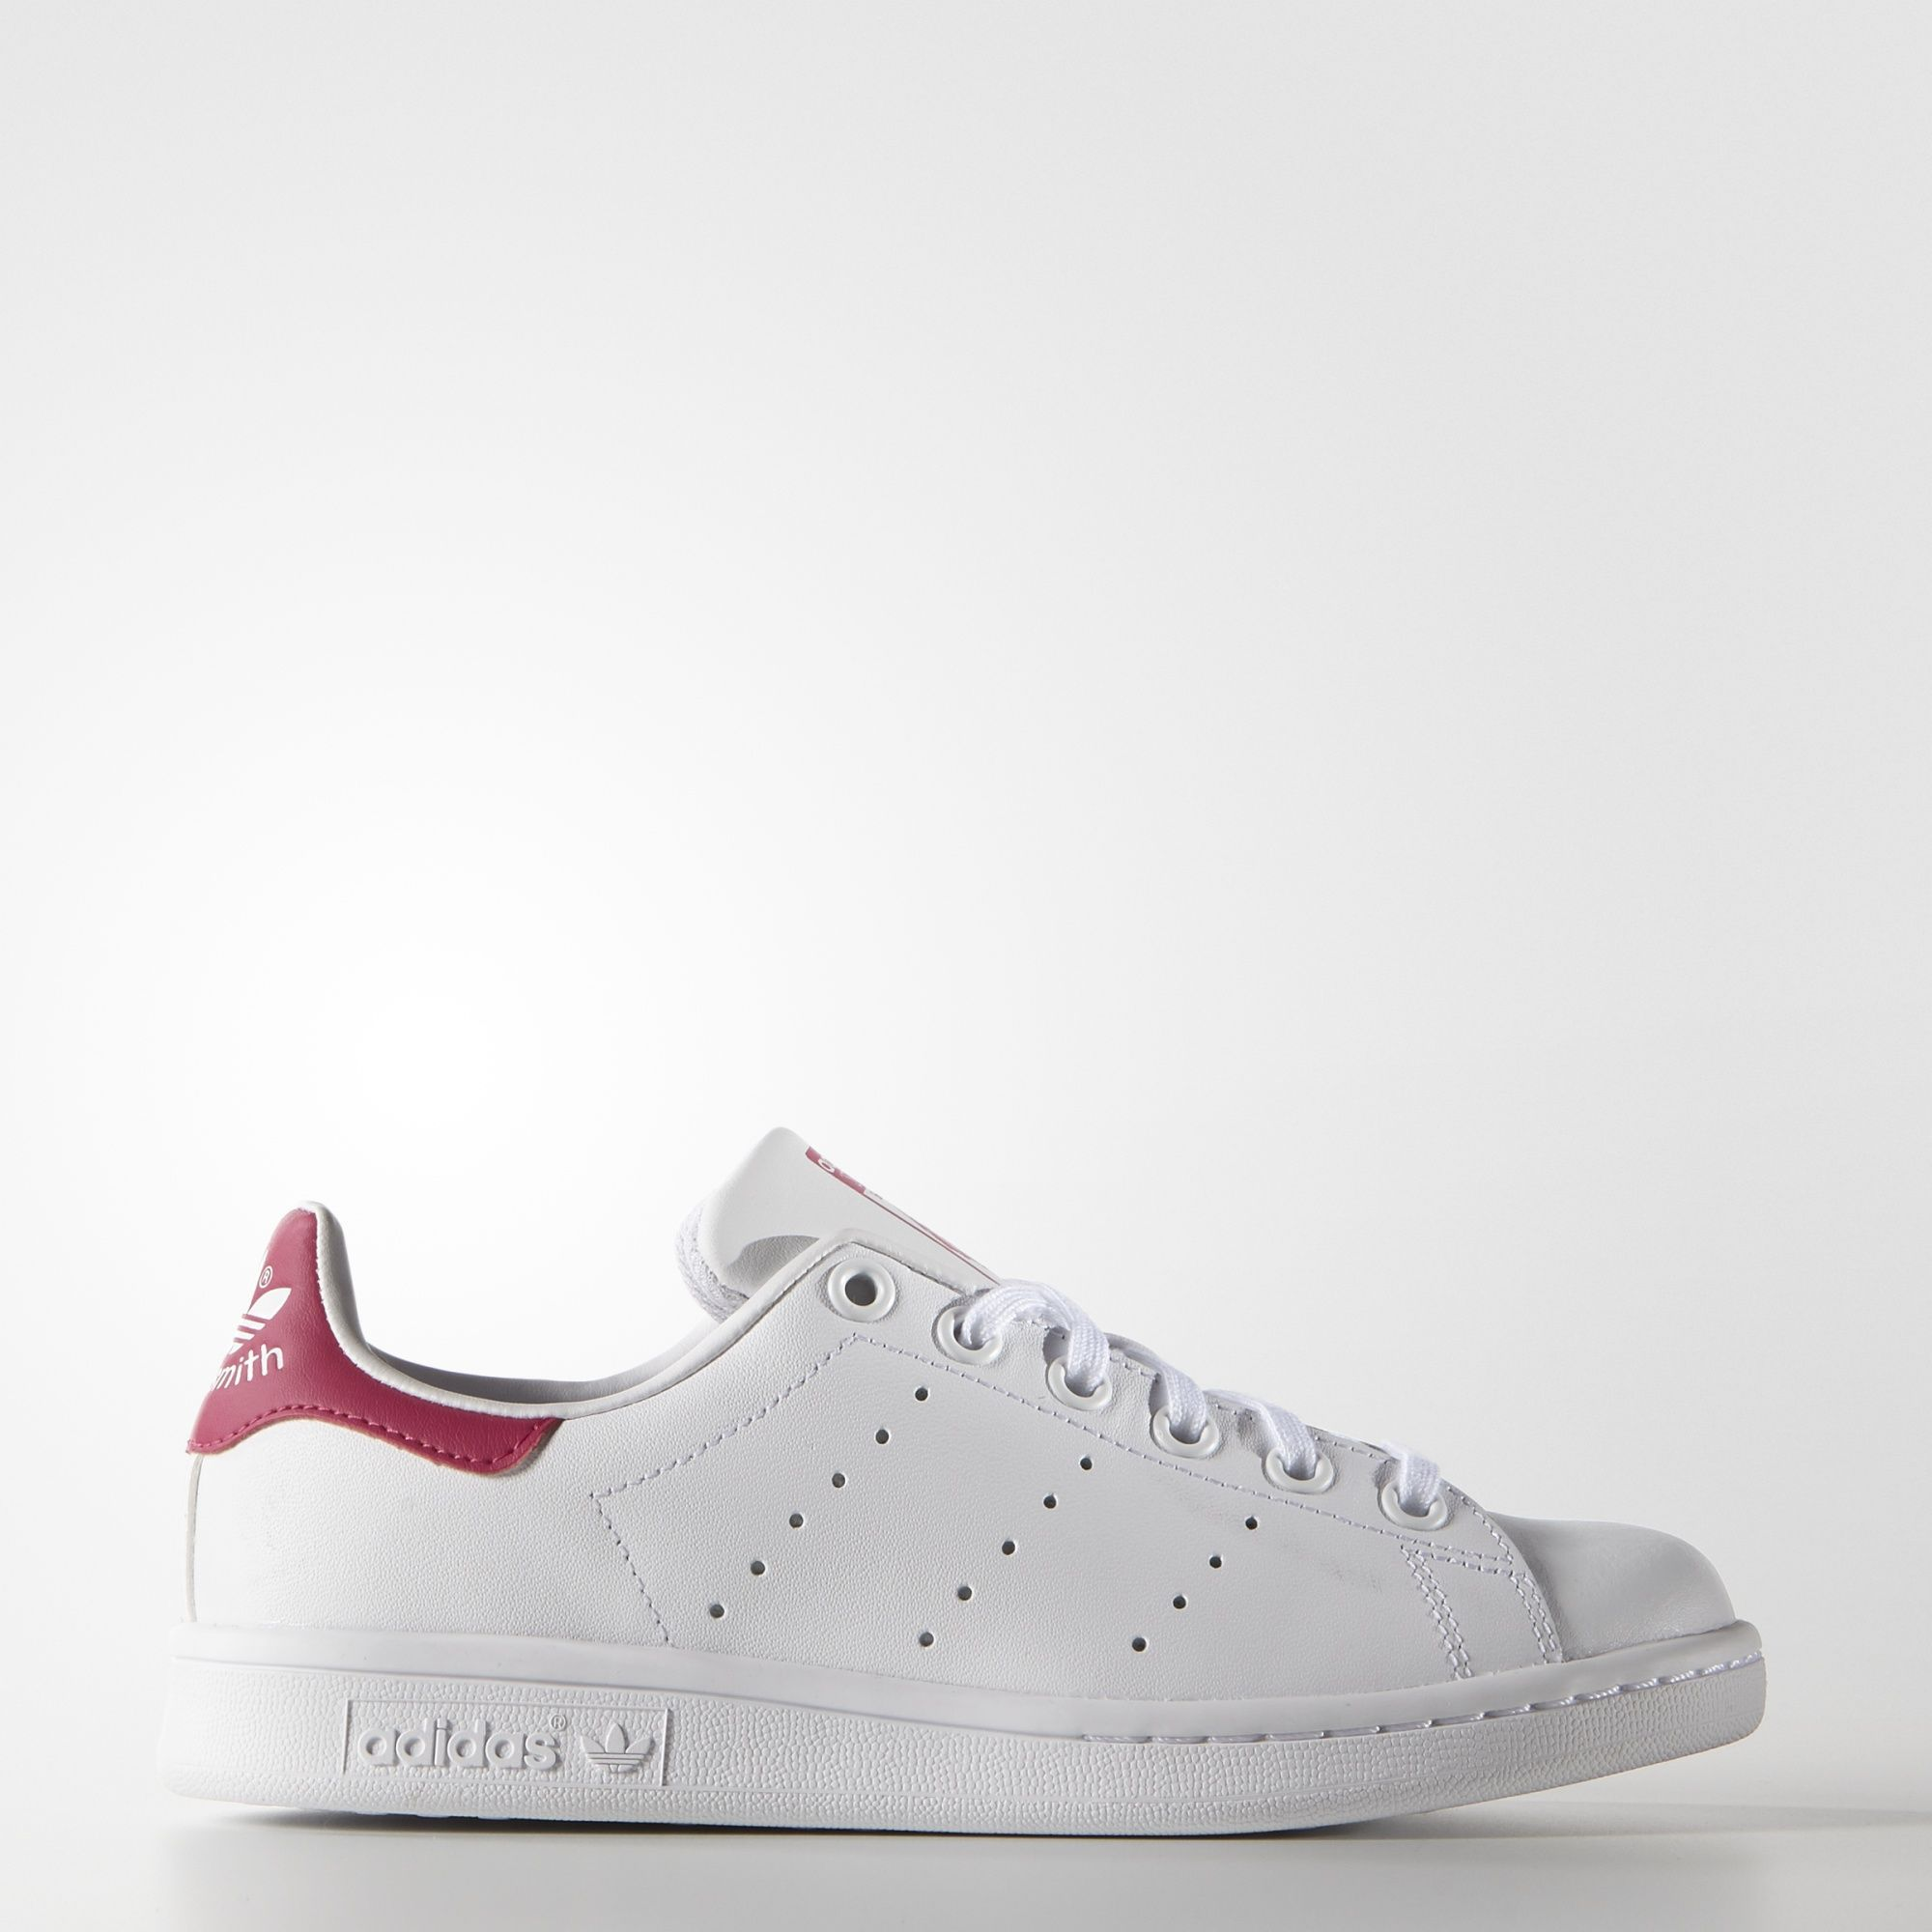 adidas gazelle kids velcro shoes adidas stan smith vulc skate shoes  black black white